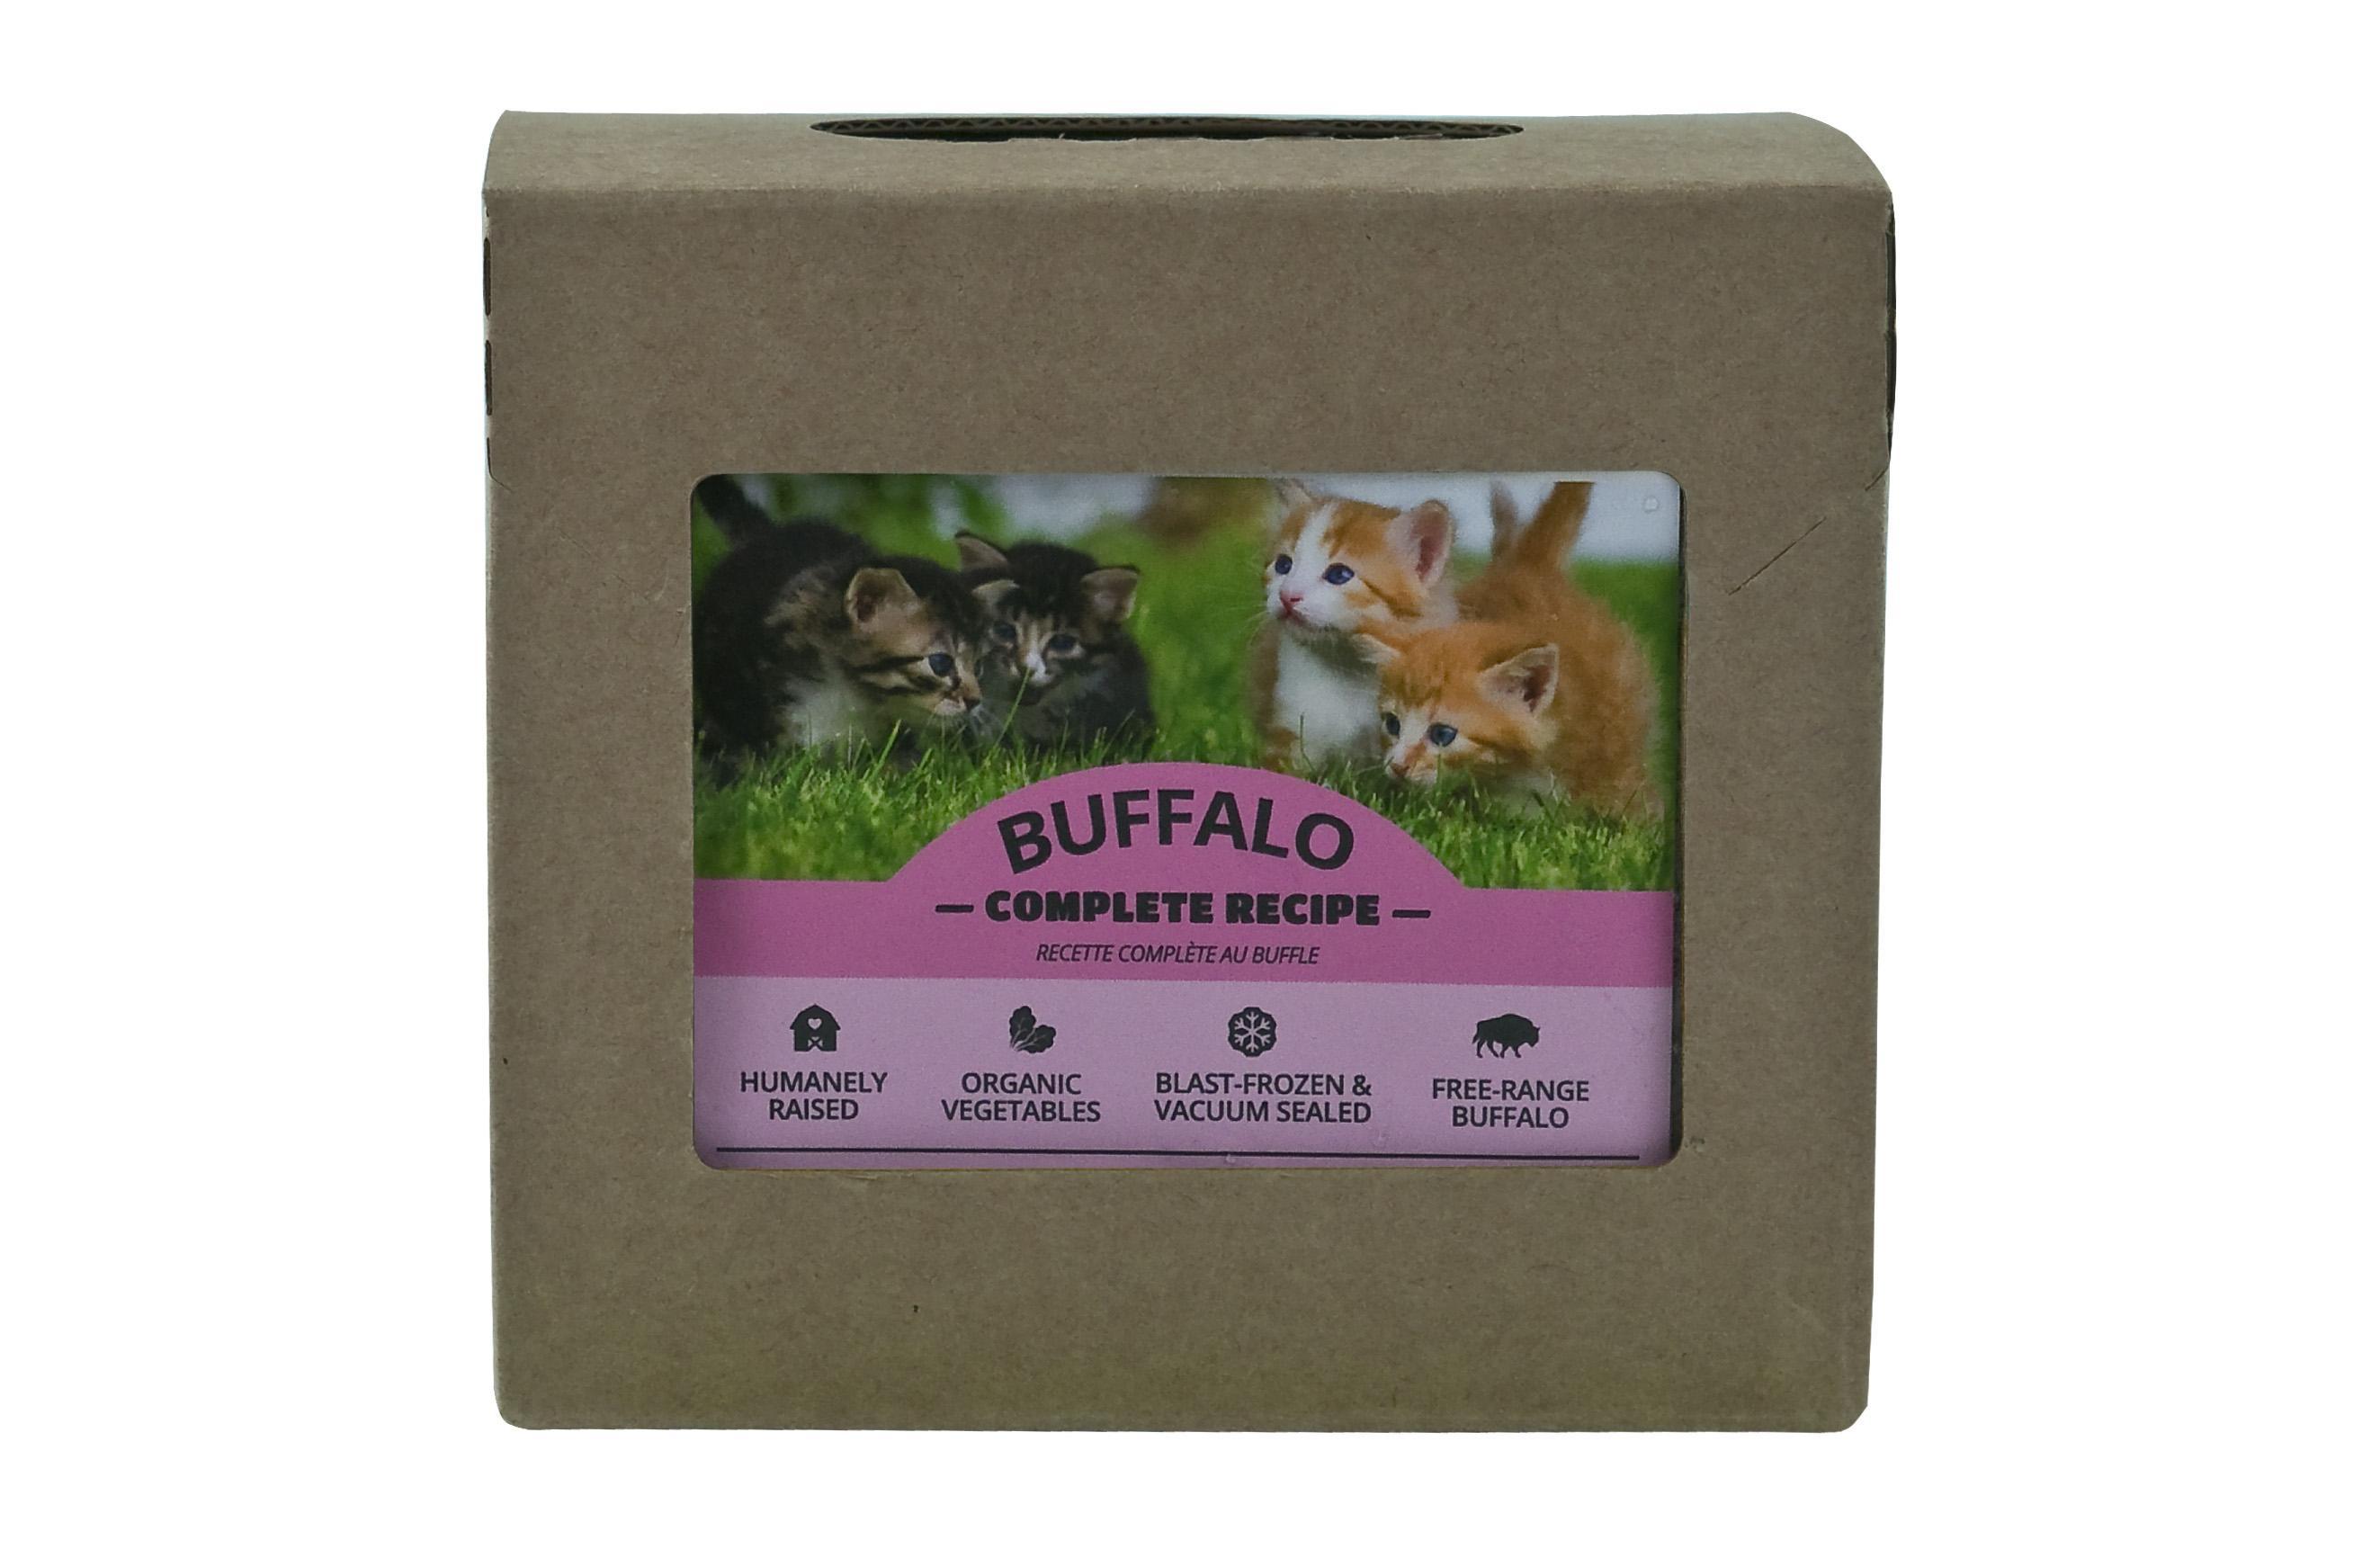 Red Dog Blue Kat Buffalo Complete Recipe Frozen Cat Food, 1/4-lb